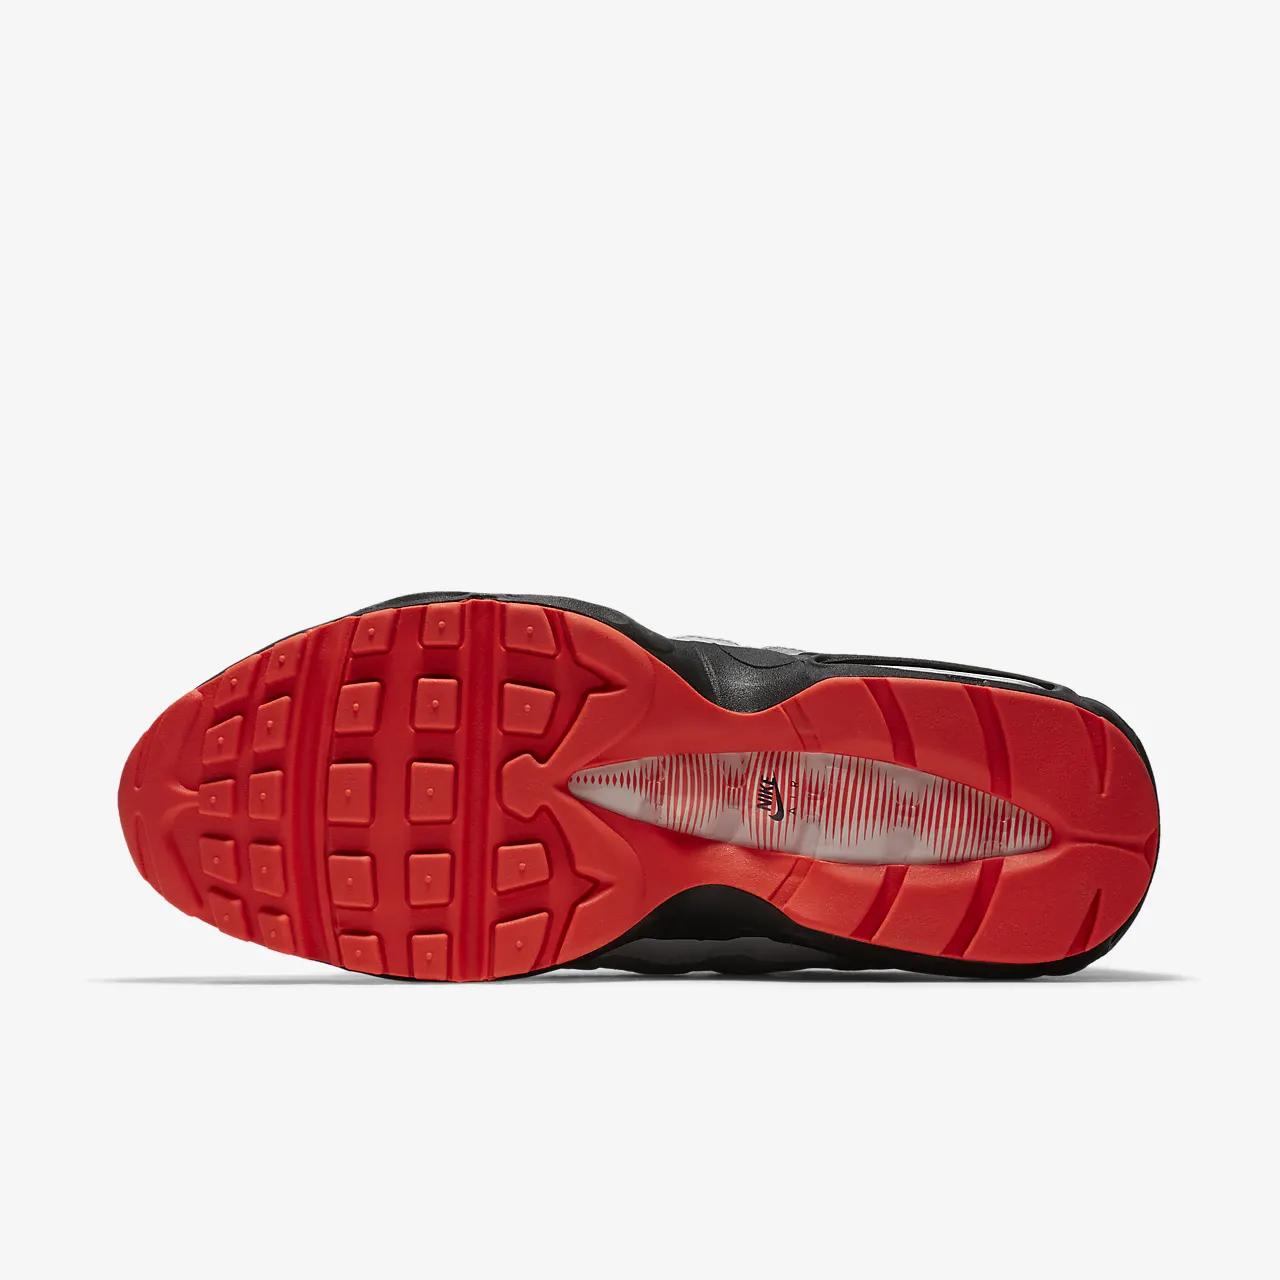 Nike Air Max 95 Essential Men's Shoe 749766-112